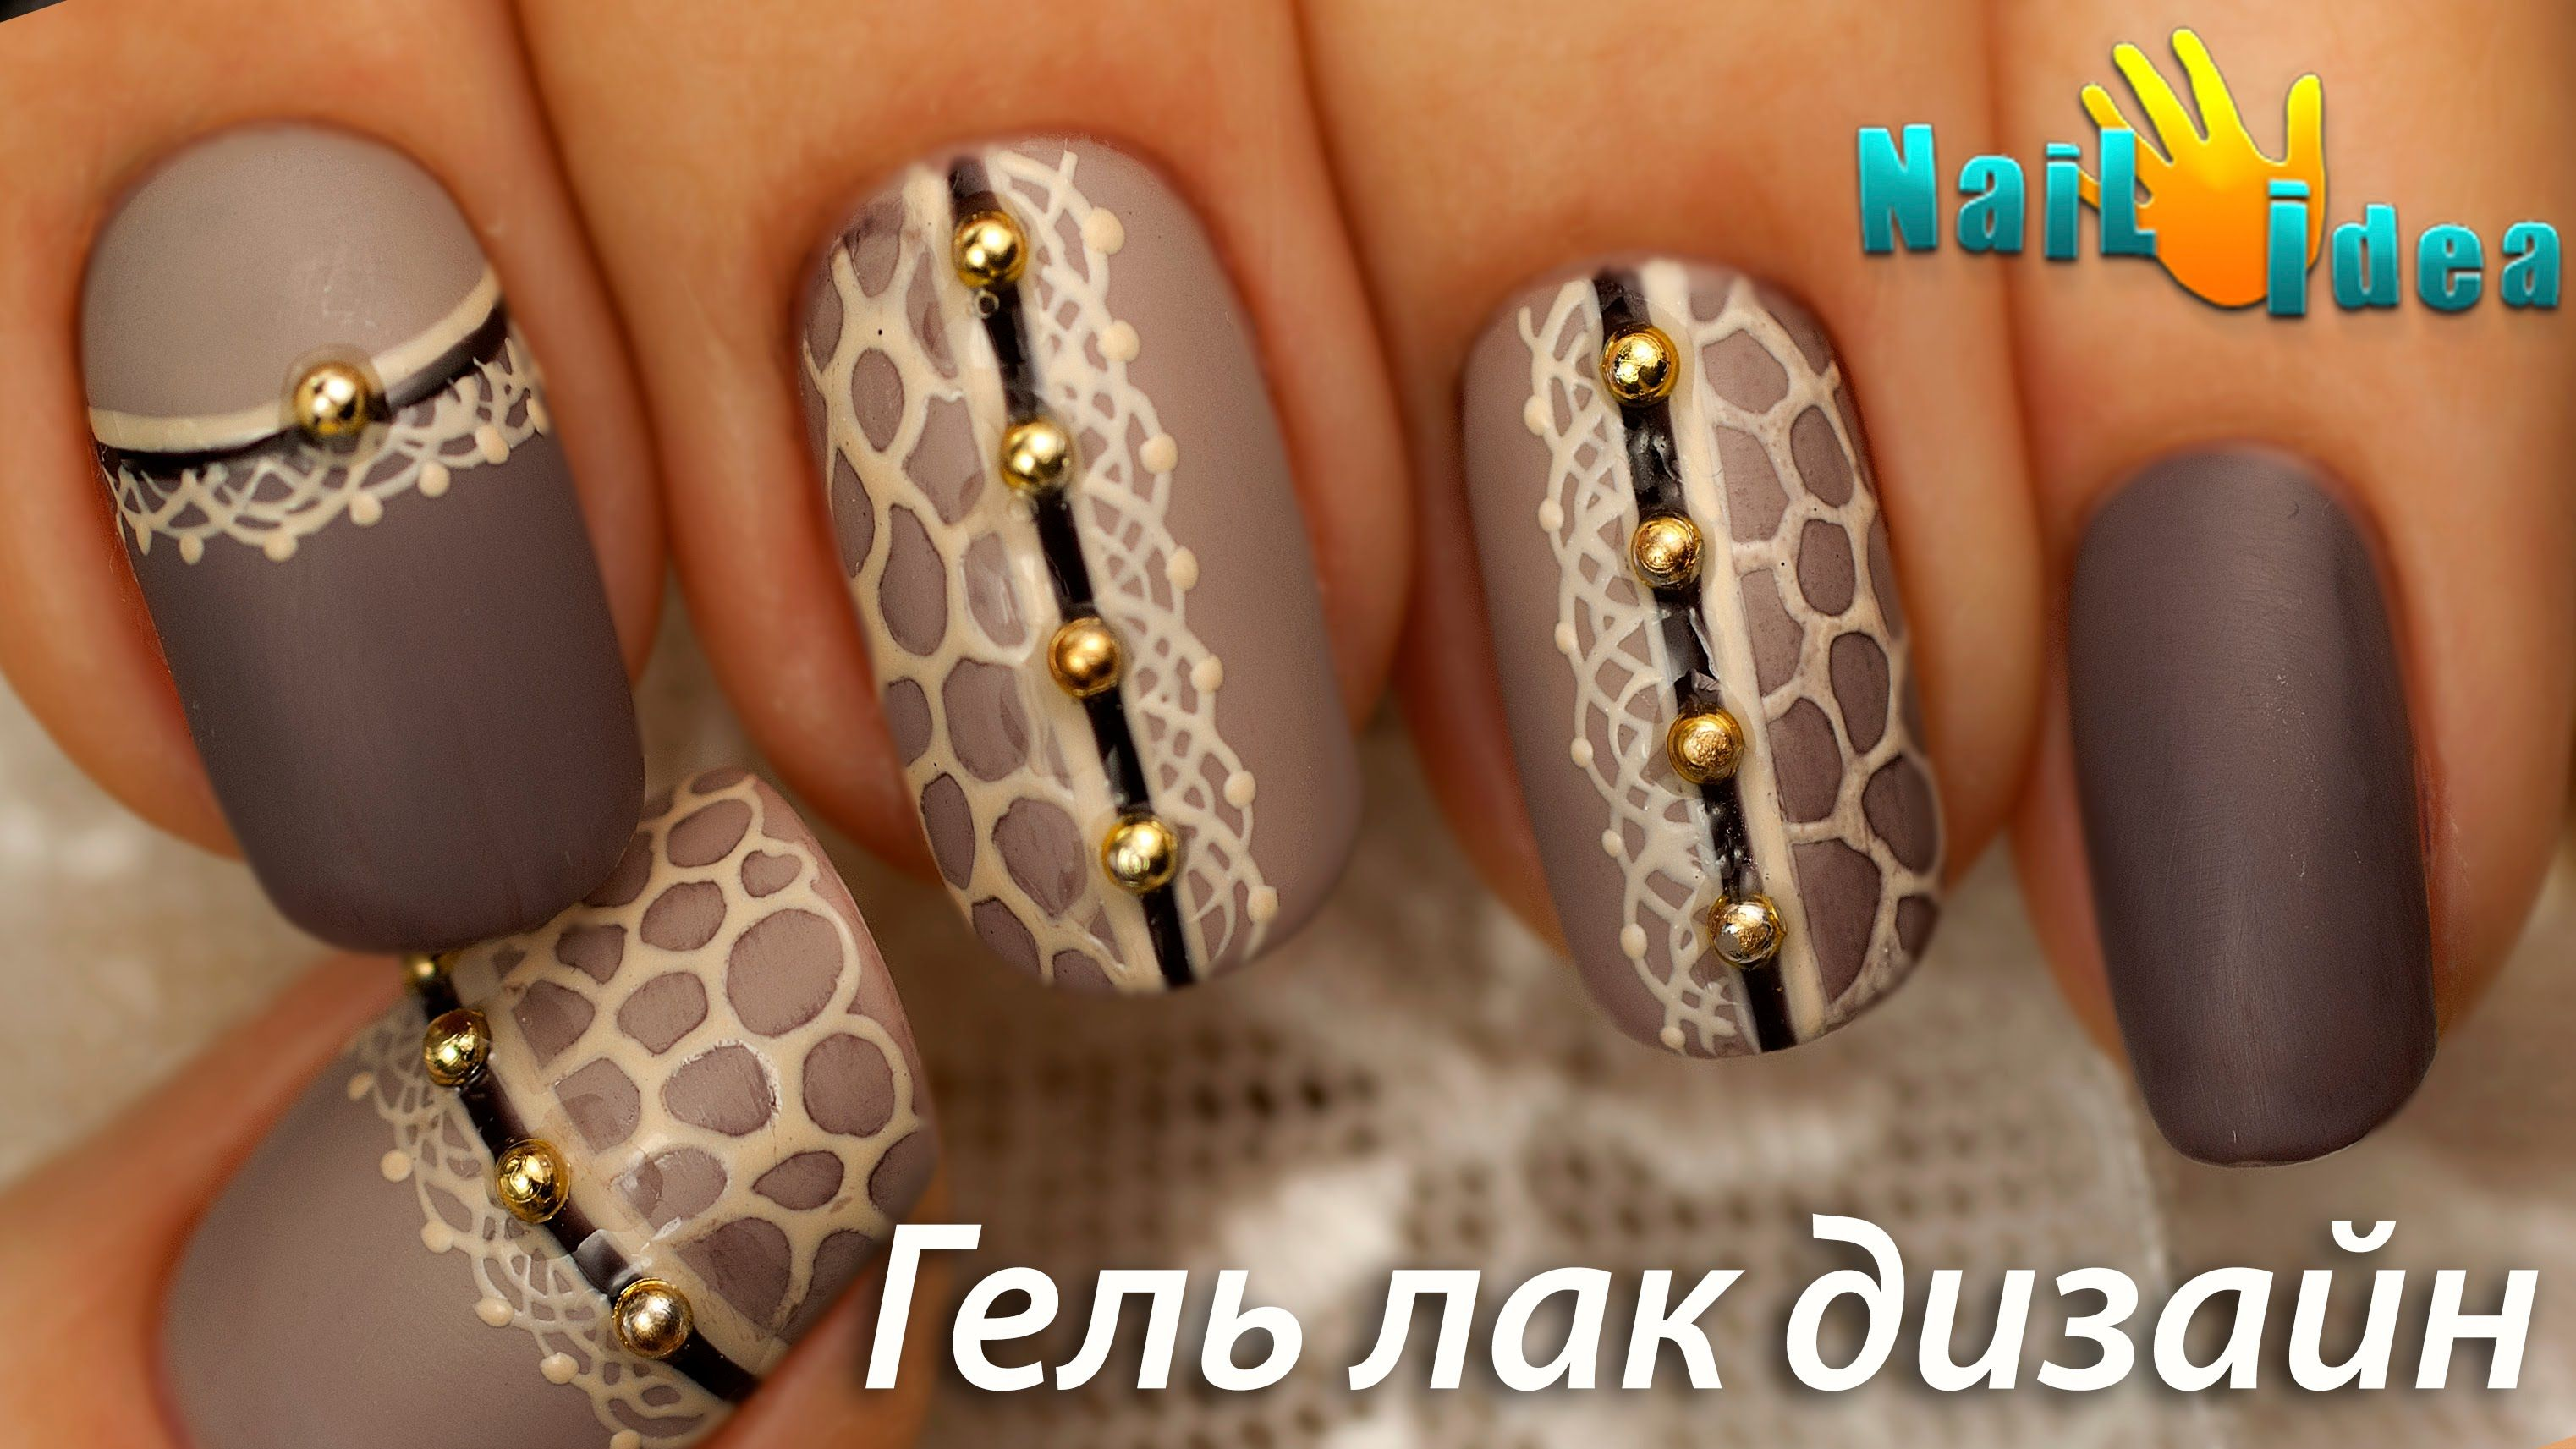 Ногти Идеи Маникюра Осень